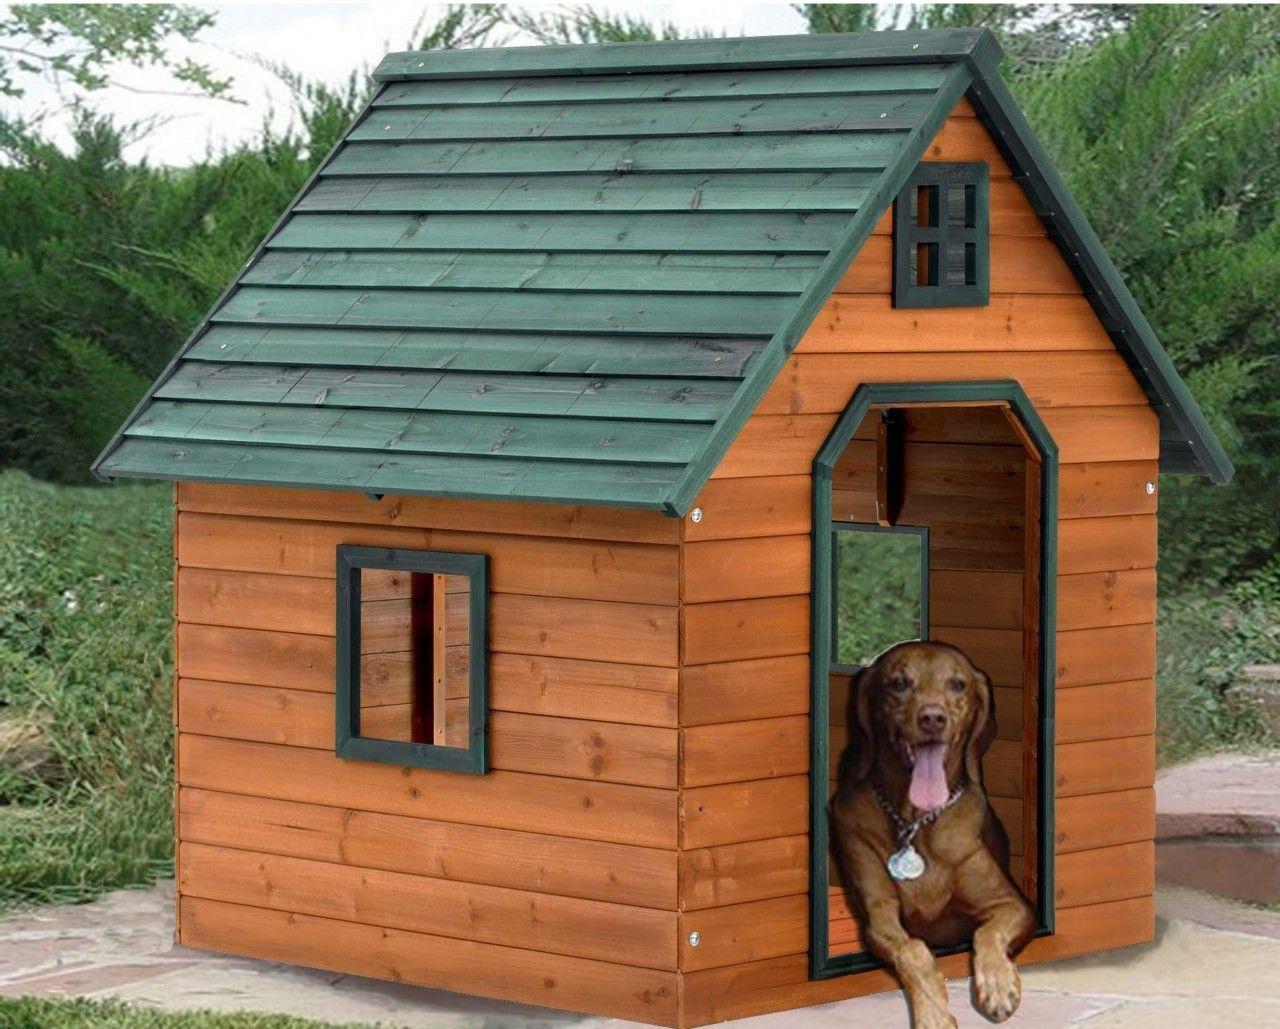 Dog Houses Dog Houses For Sale Large Dog Kennels Dog House